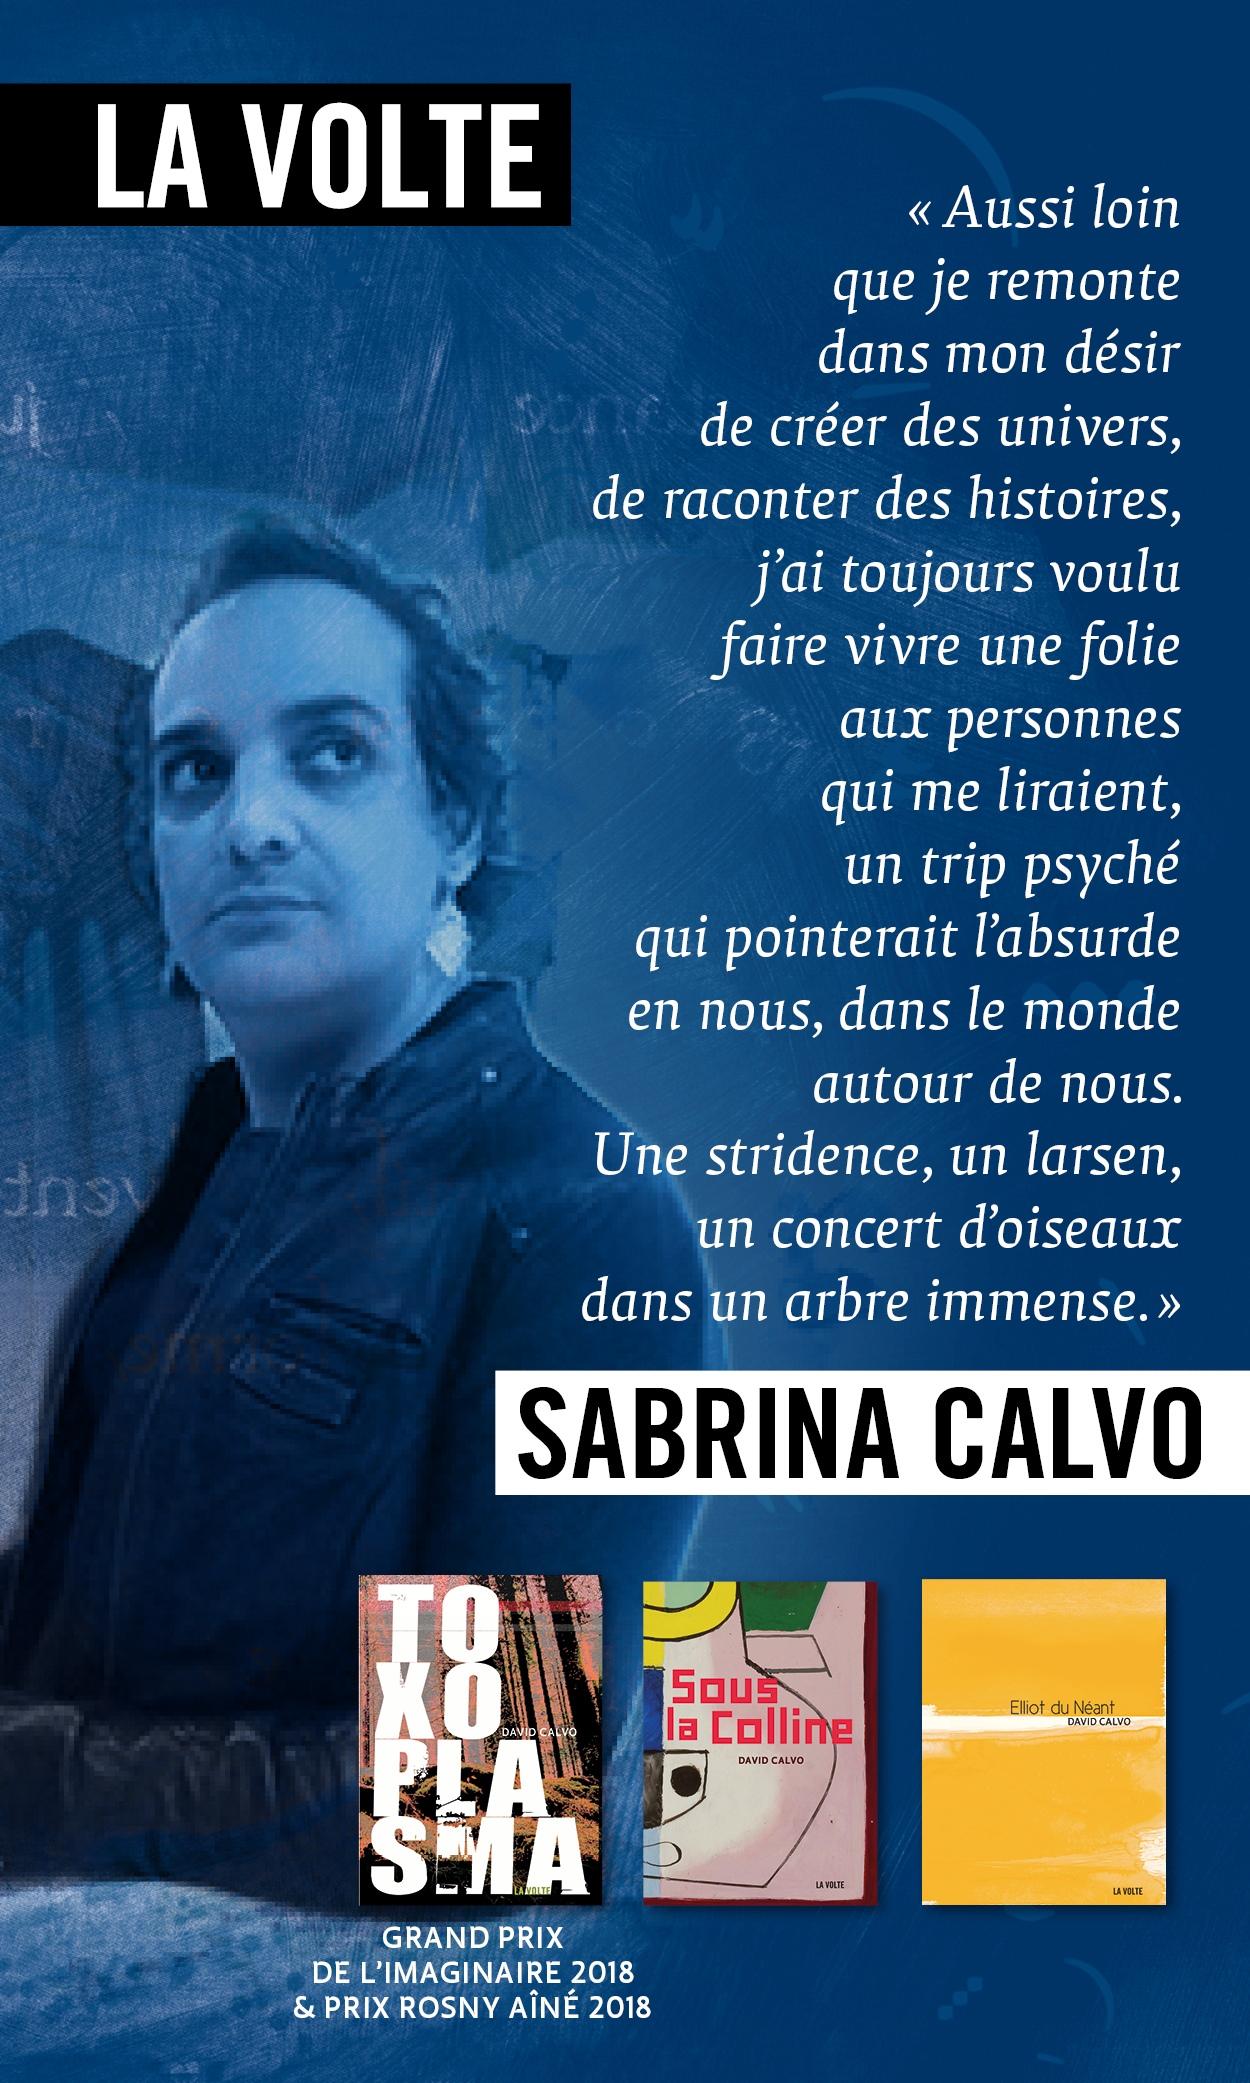 Sabrina Calvo - Mois de l'imaginaire